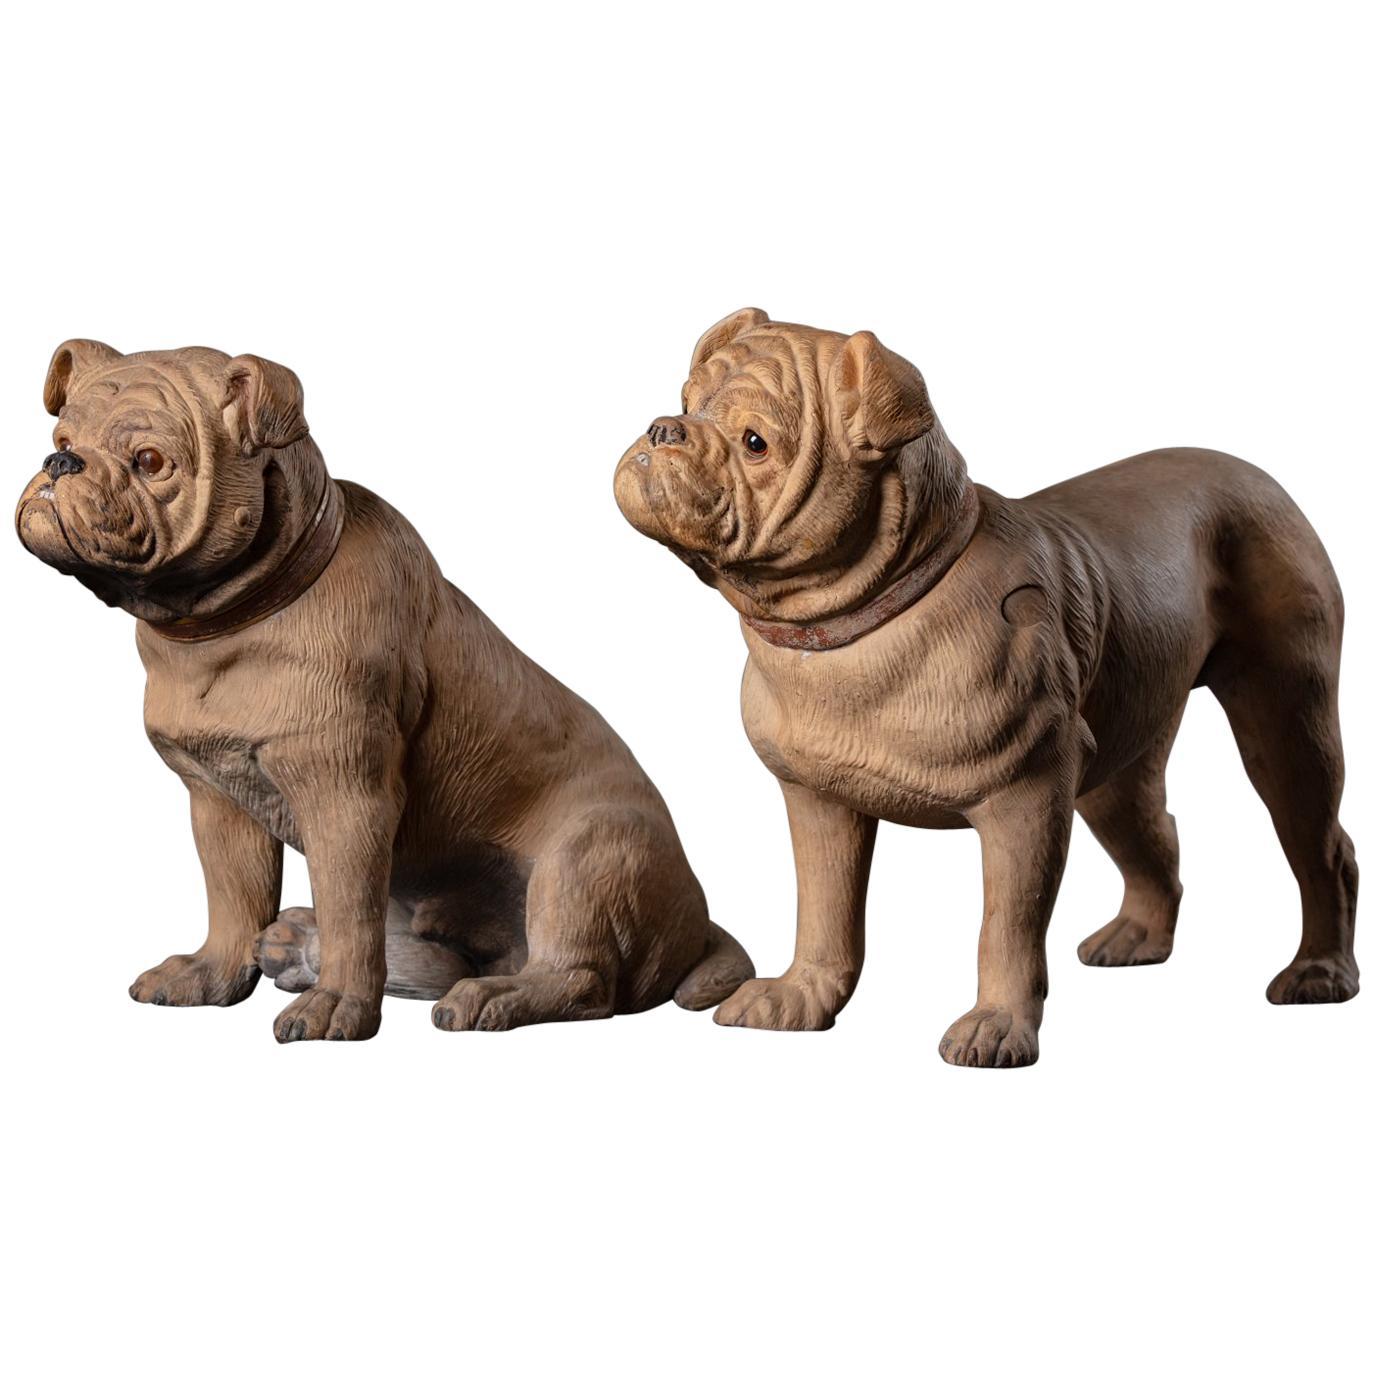 19th Century English Pair of Terracotta Bulldogs